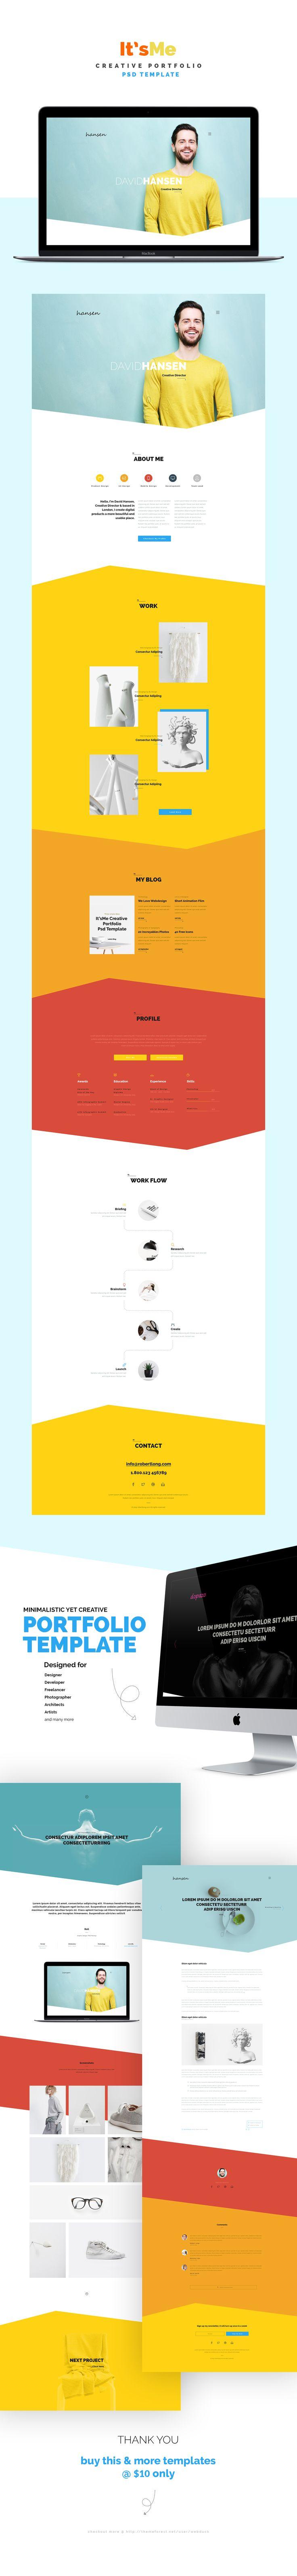 It'sMe - Creative Portfolio PSD Template 3 on Behance